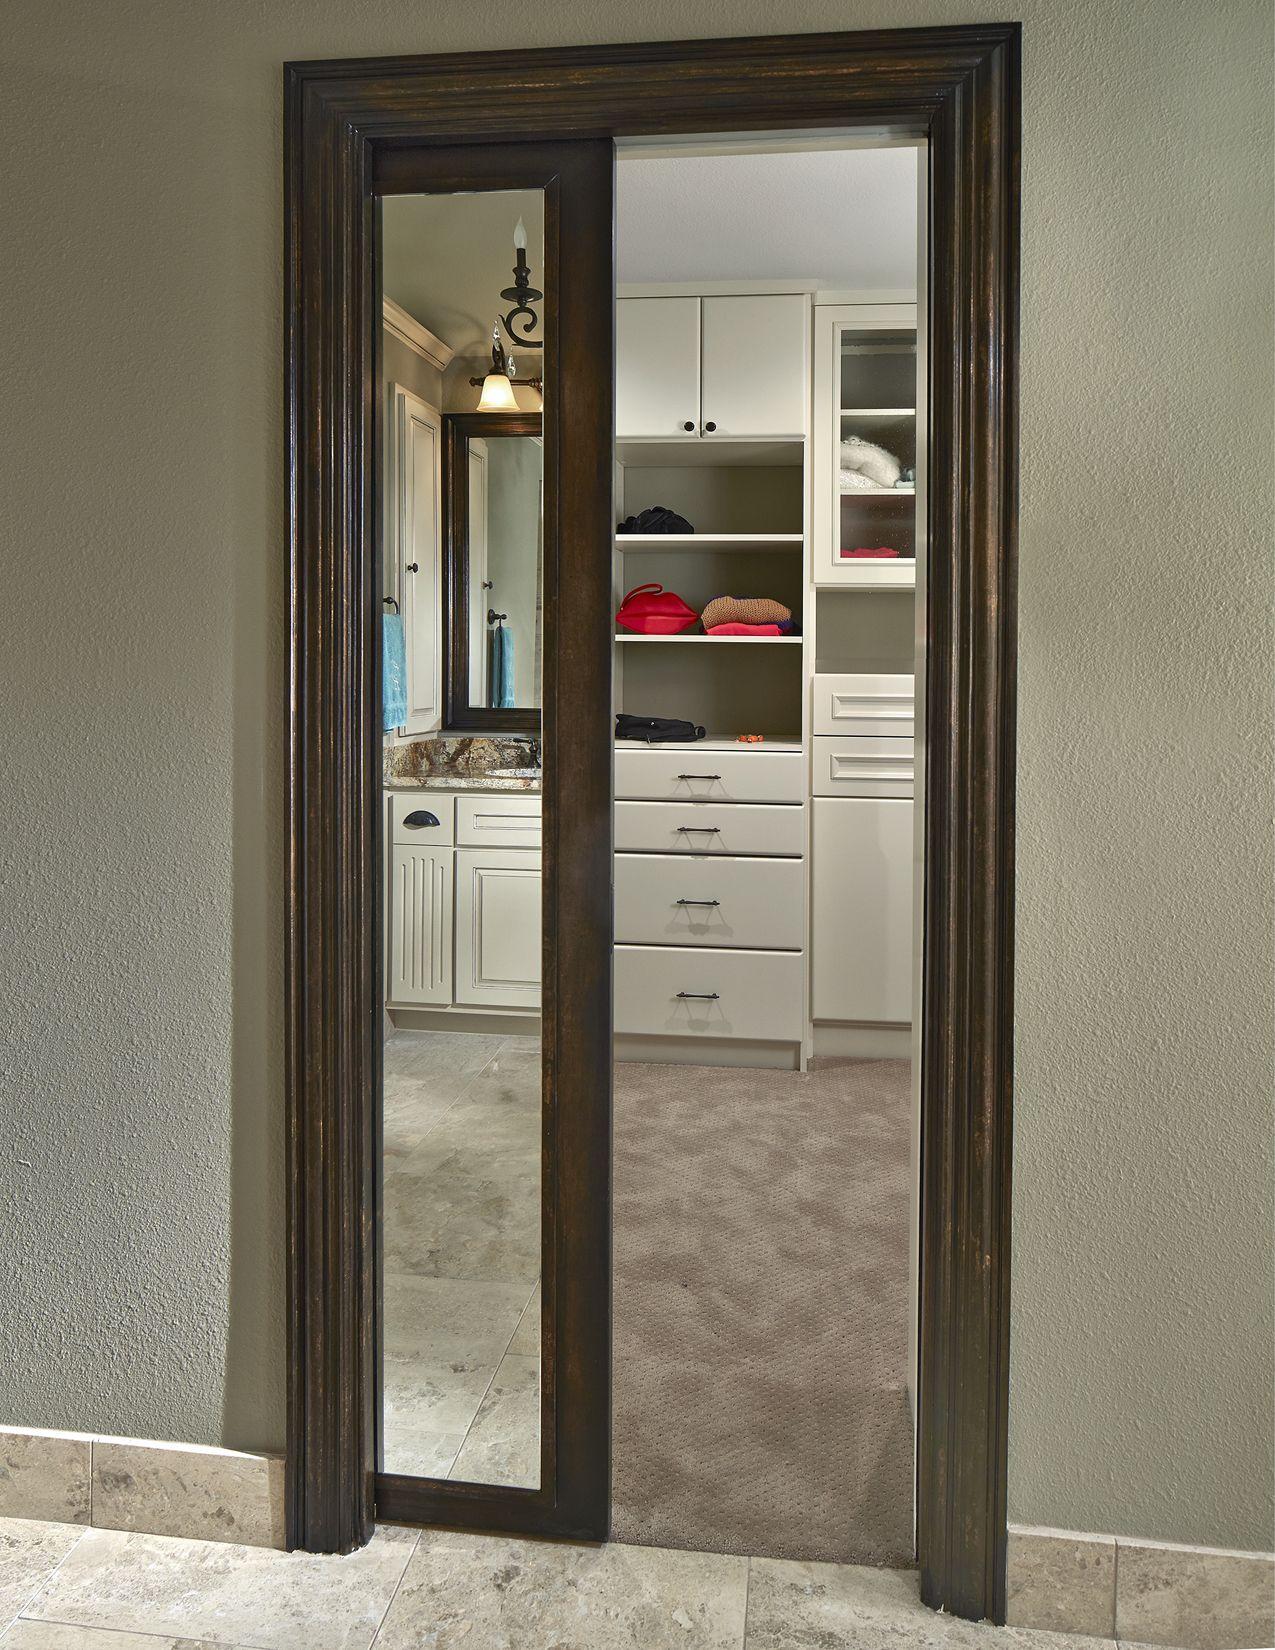 Old Shepard Framed Mirror Pocket Door Into Wellborn Distinctive